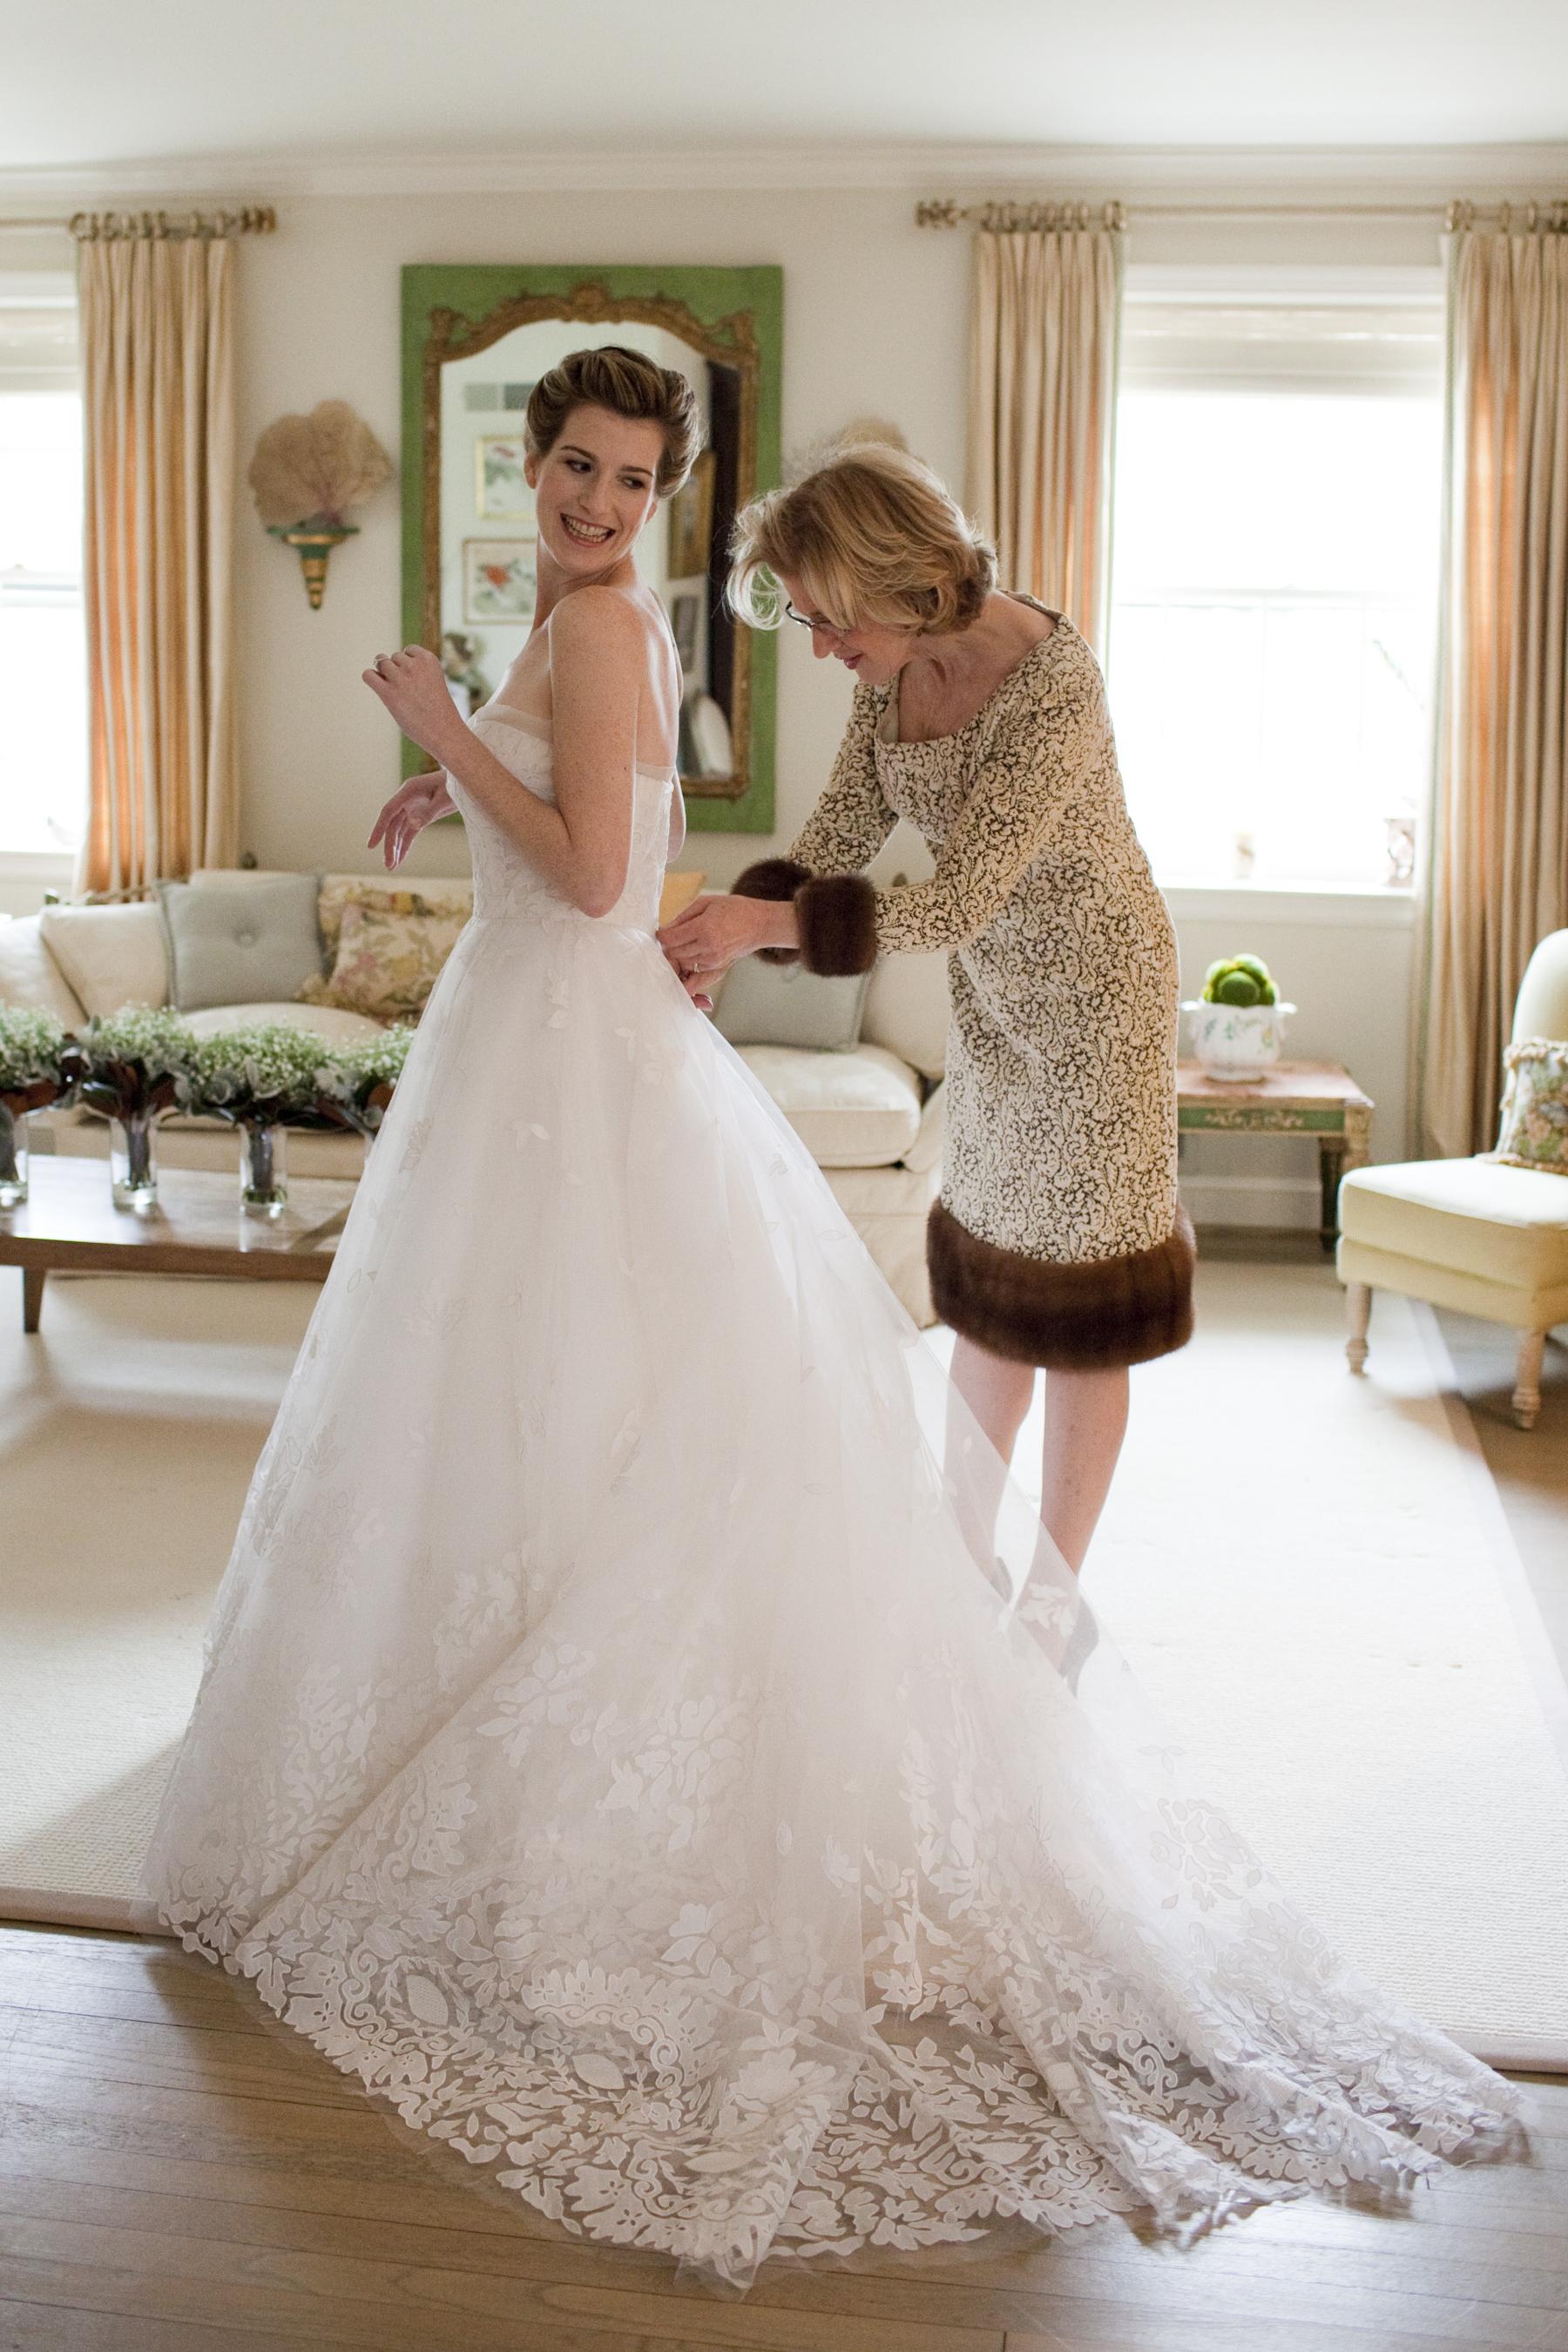 fantasy-bridal-wedding-dress-before-engagement